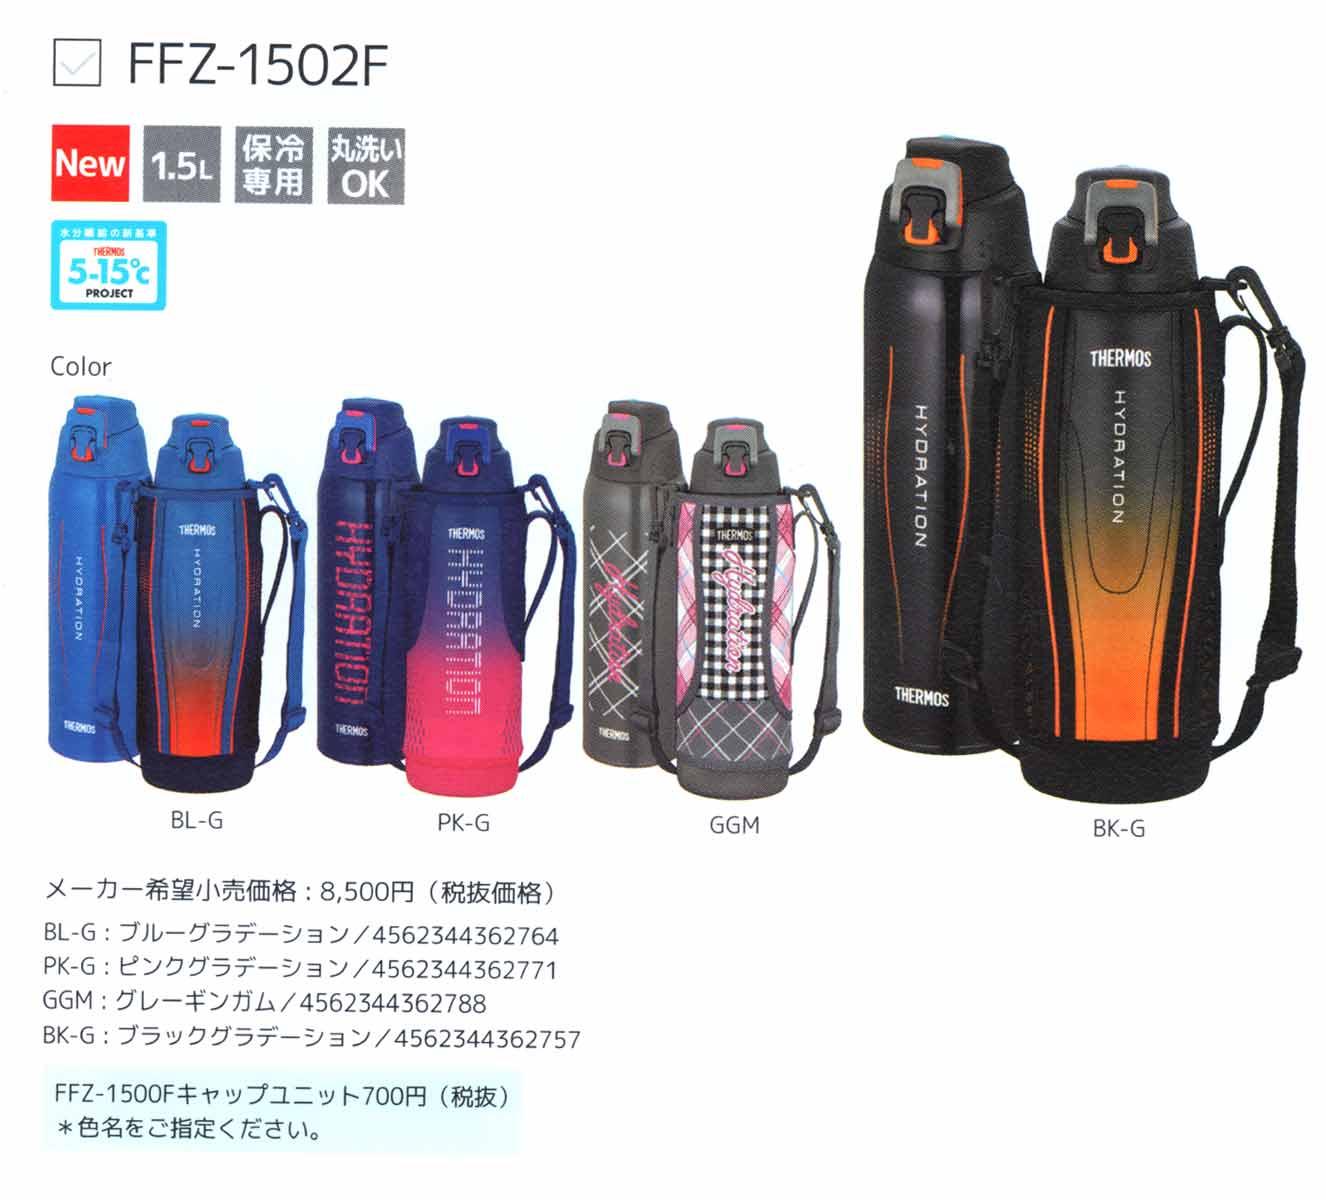 THERMOS vacuum insulation sports bottle 1.5L black gradation FFZ-1502F BK-G NEW